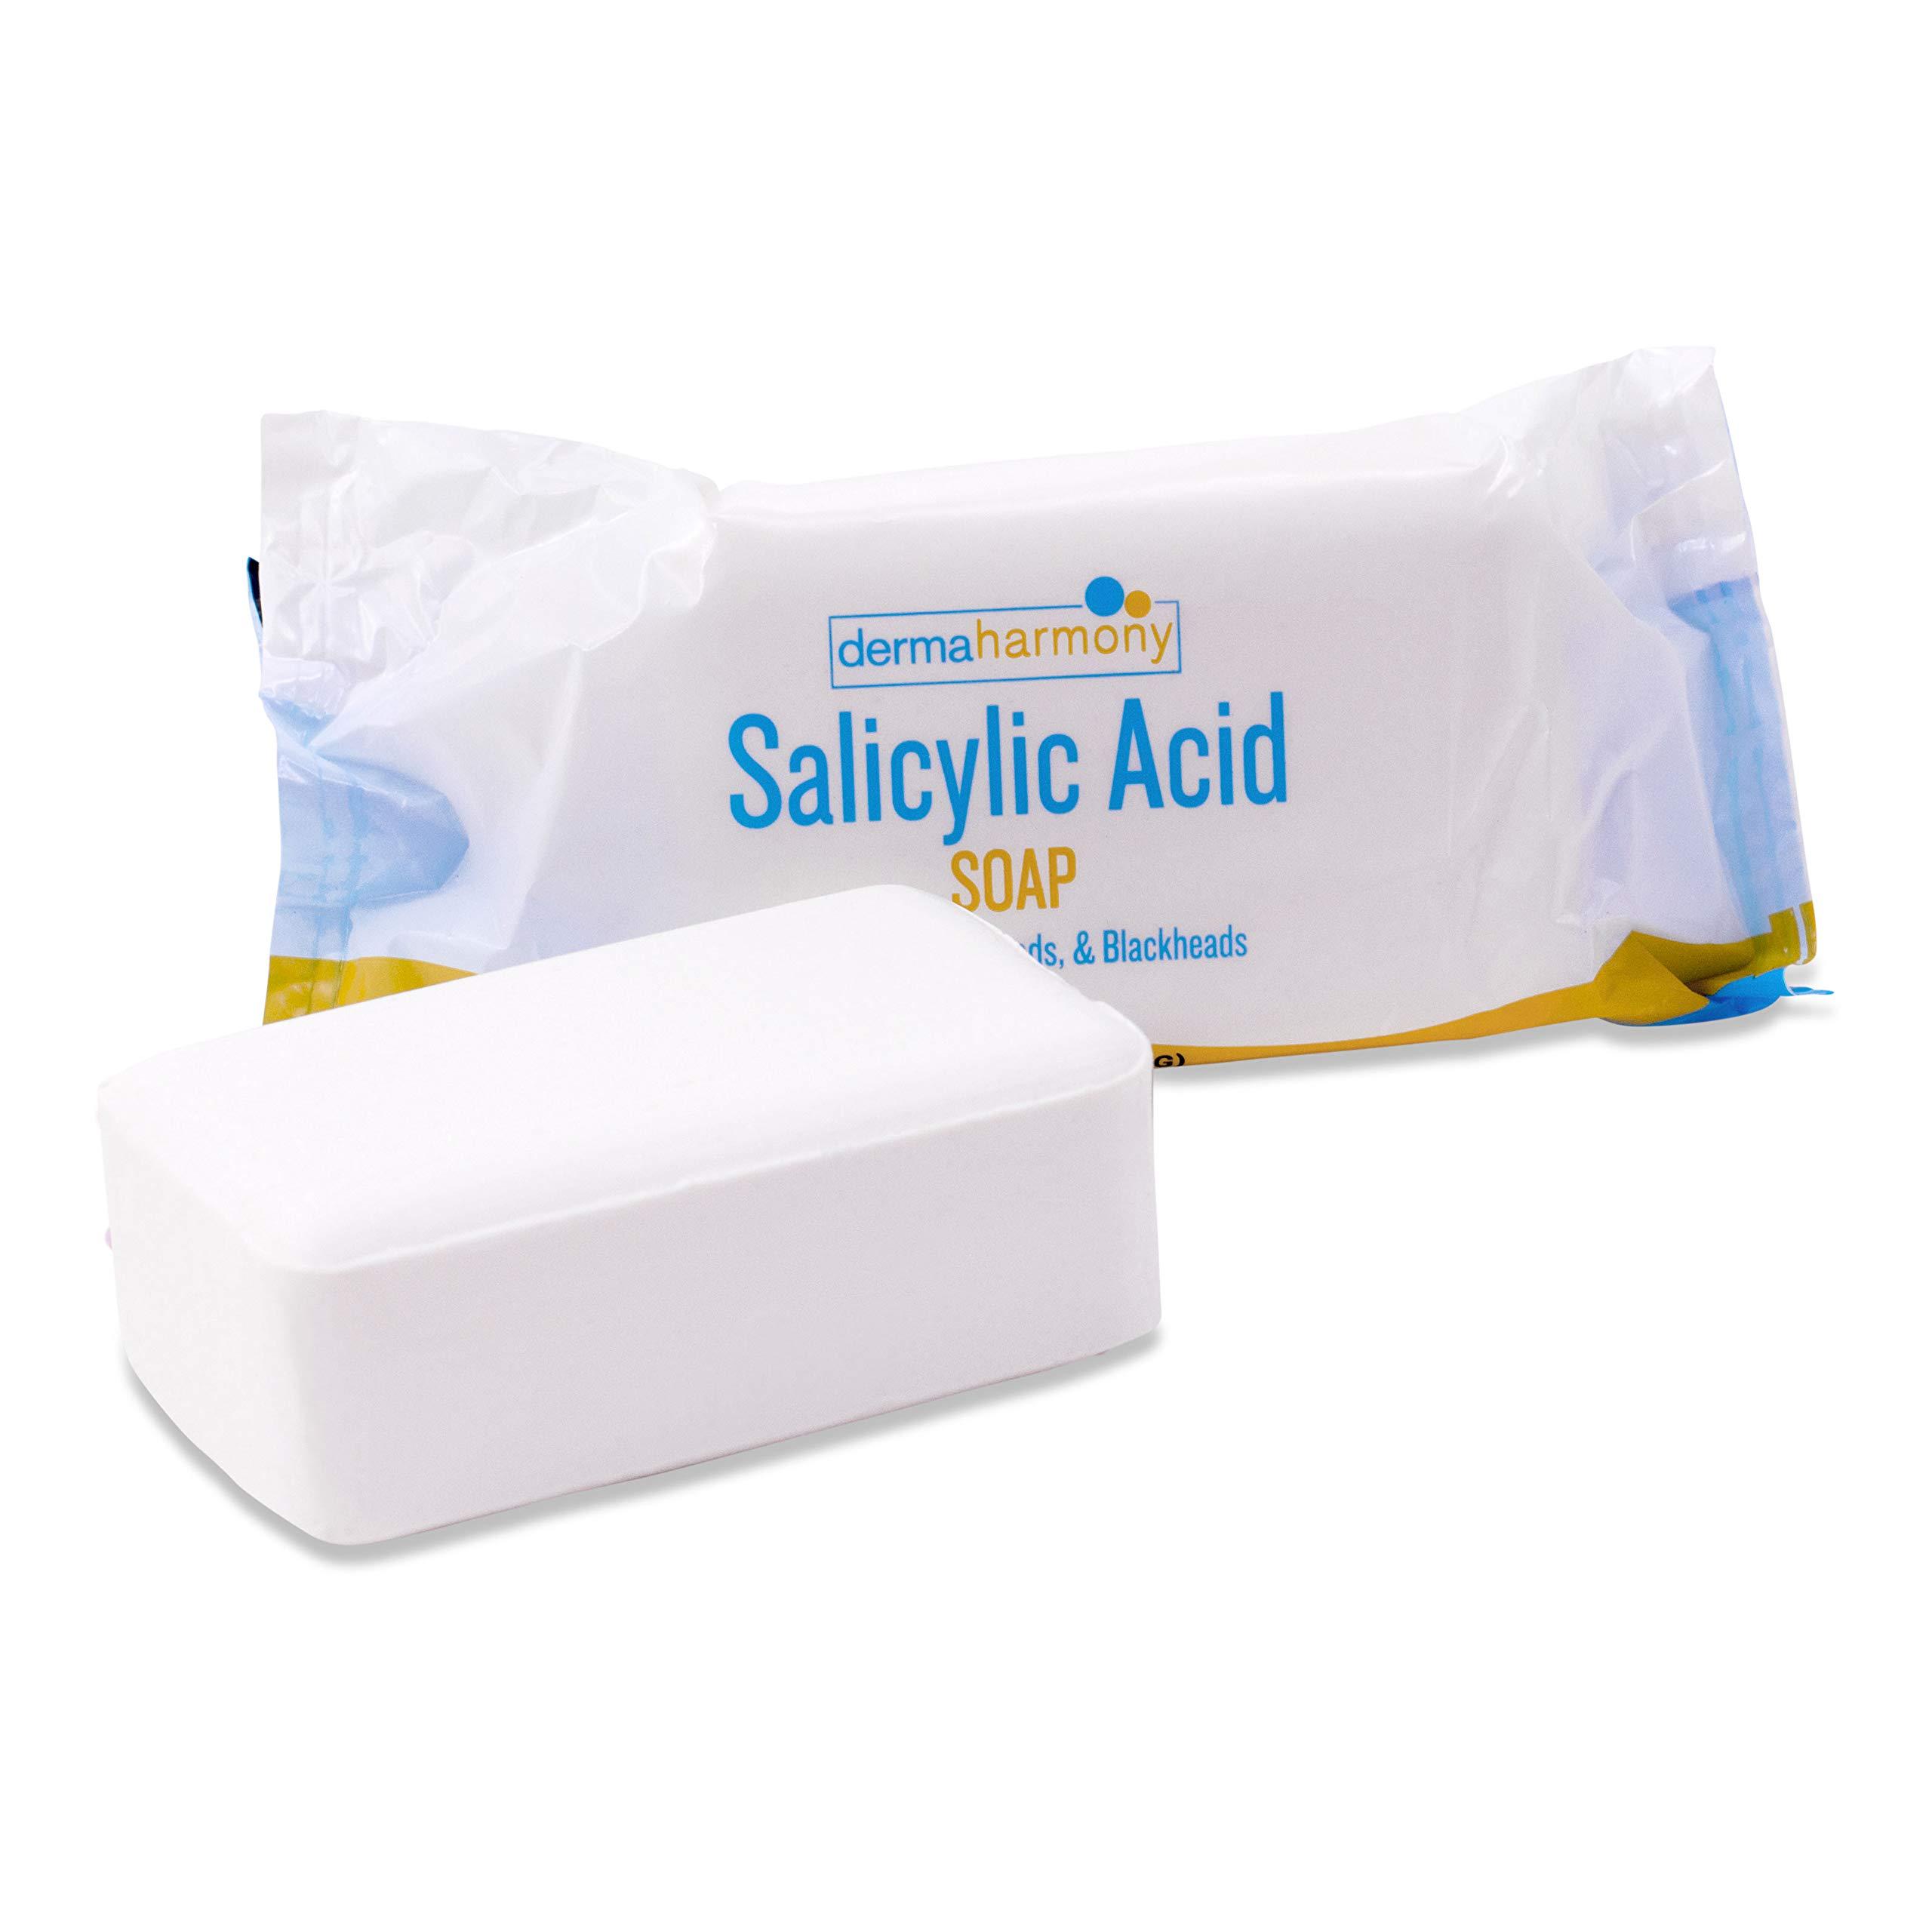 2% Salicylic Acid Natural Soap for Acne by DermaHarmony (4 oz Bar)